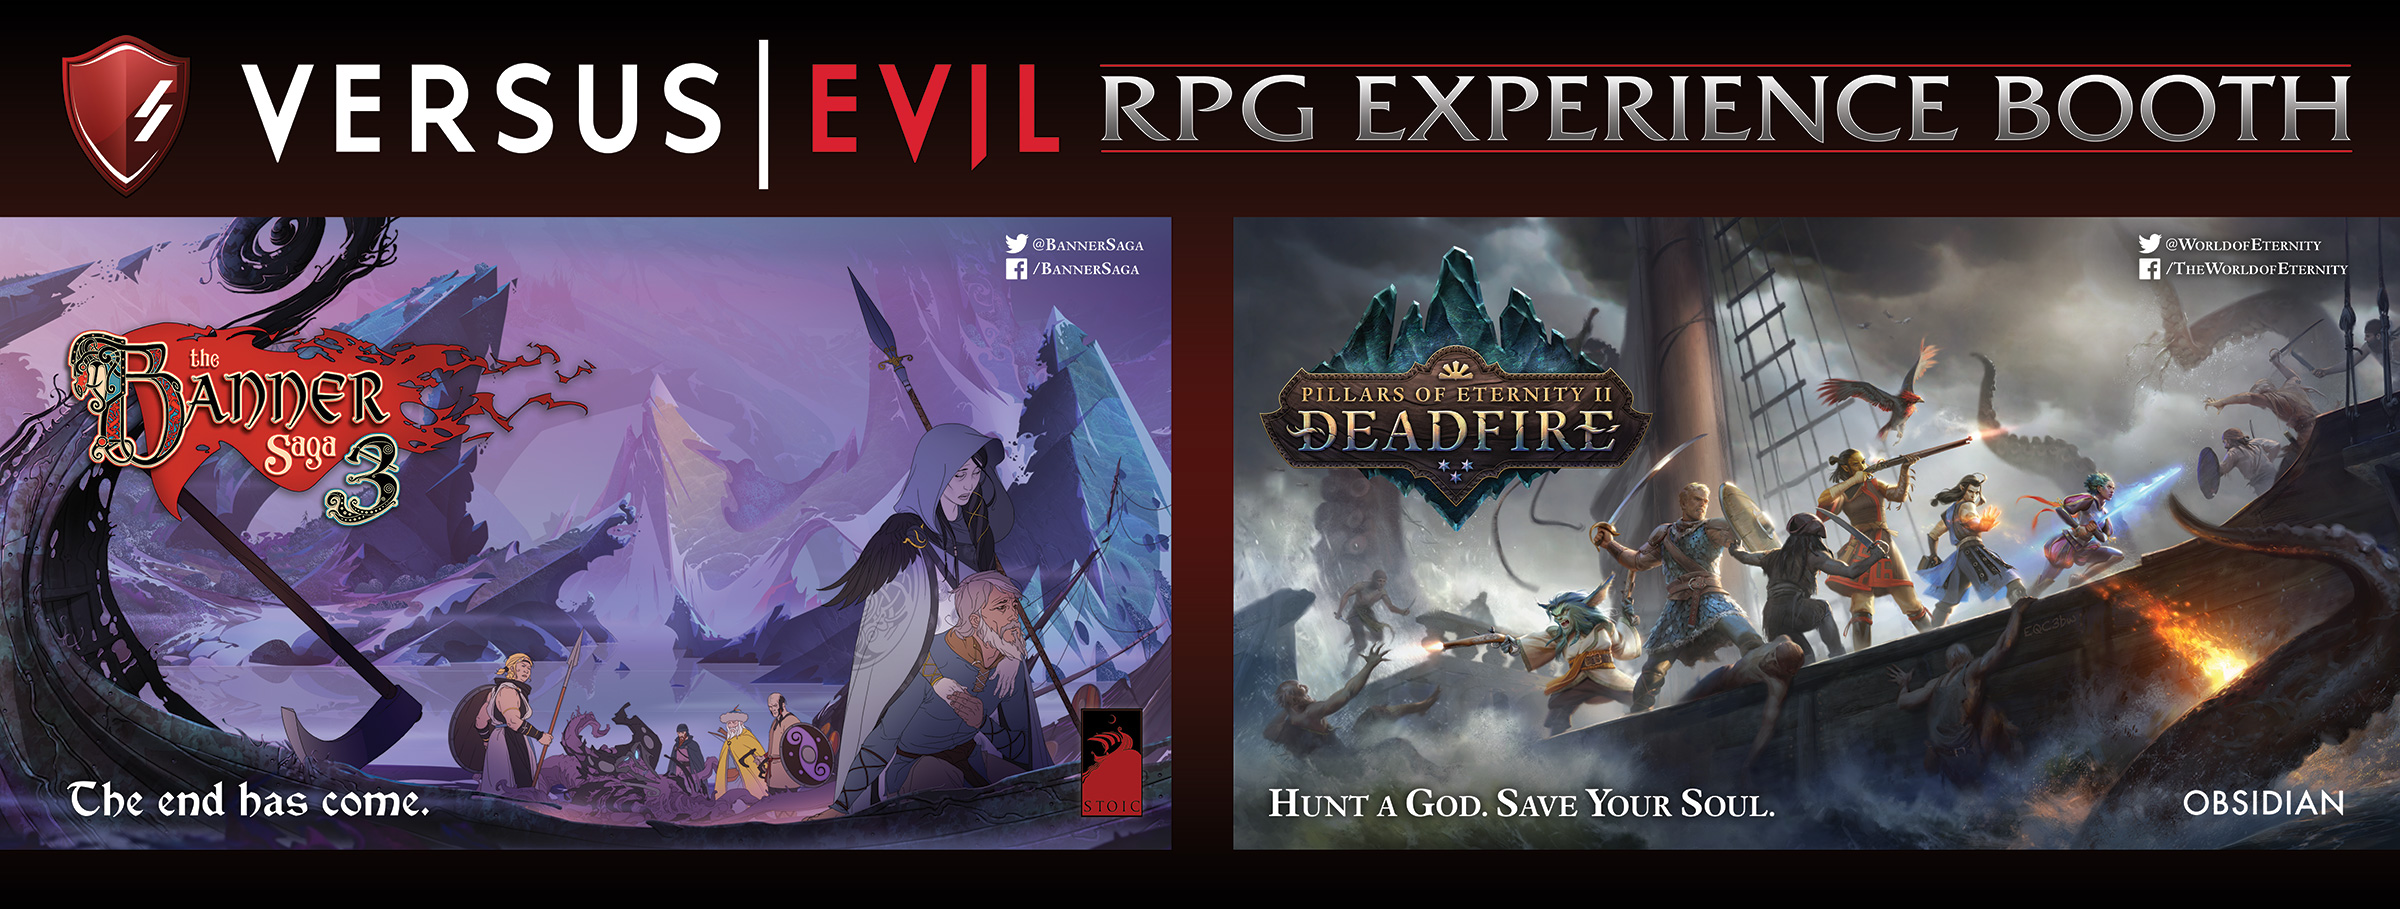 Versus Evil Creates RPG Experience at  PAX East, Boston